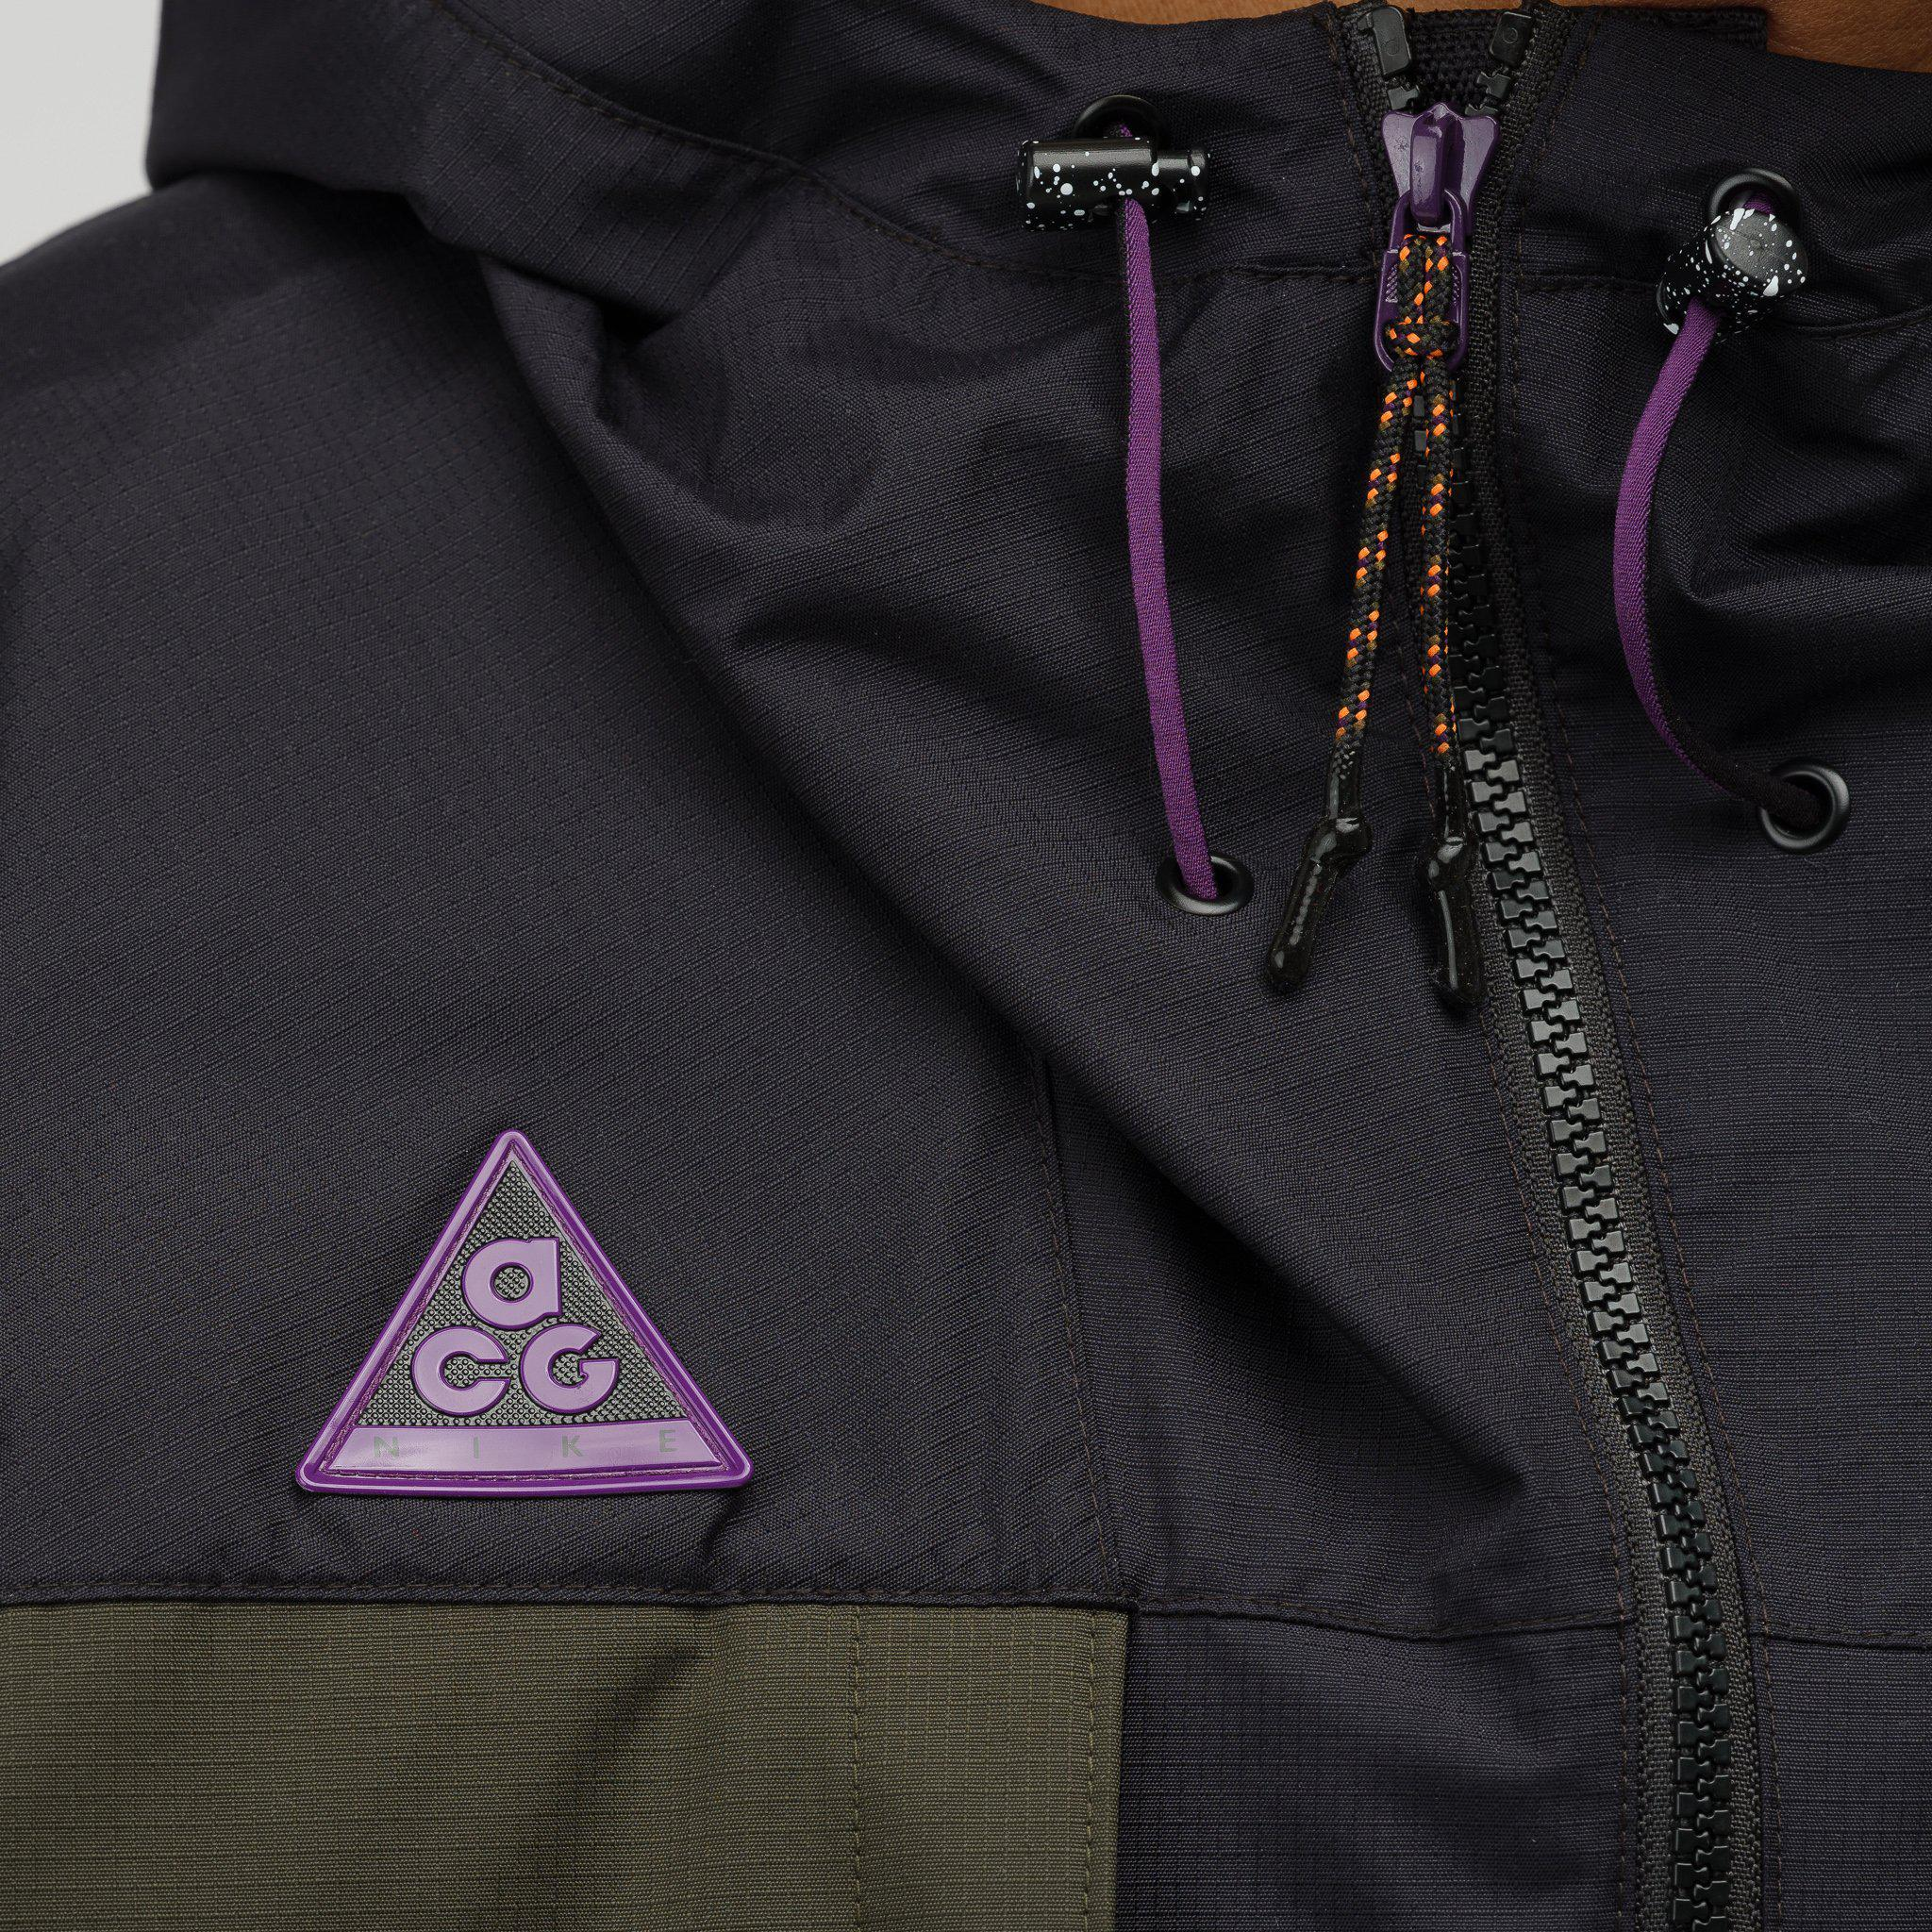 6817ed7e1 Nike Acg Anorak Jacket In Black/sequoia in Black for Men - Lyst